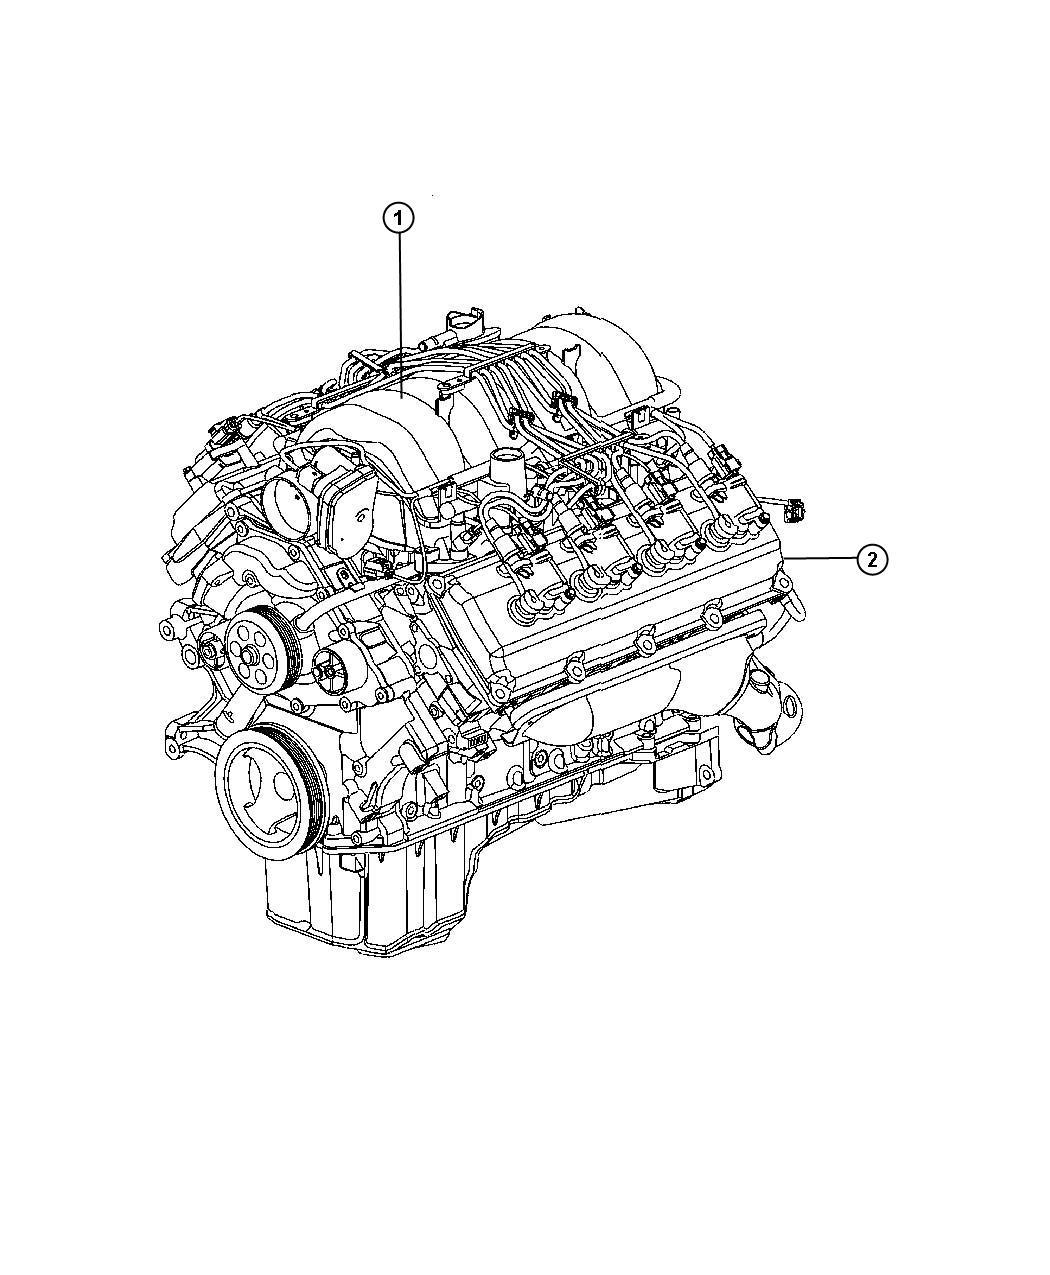 Dodge Durango Engine Long Block Remanufactured Manifold